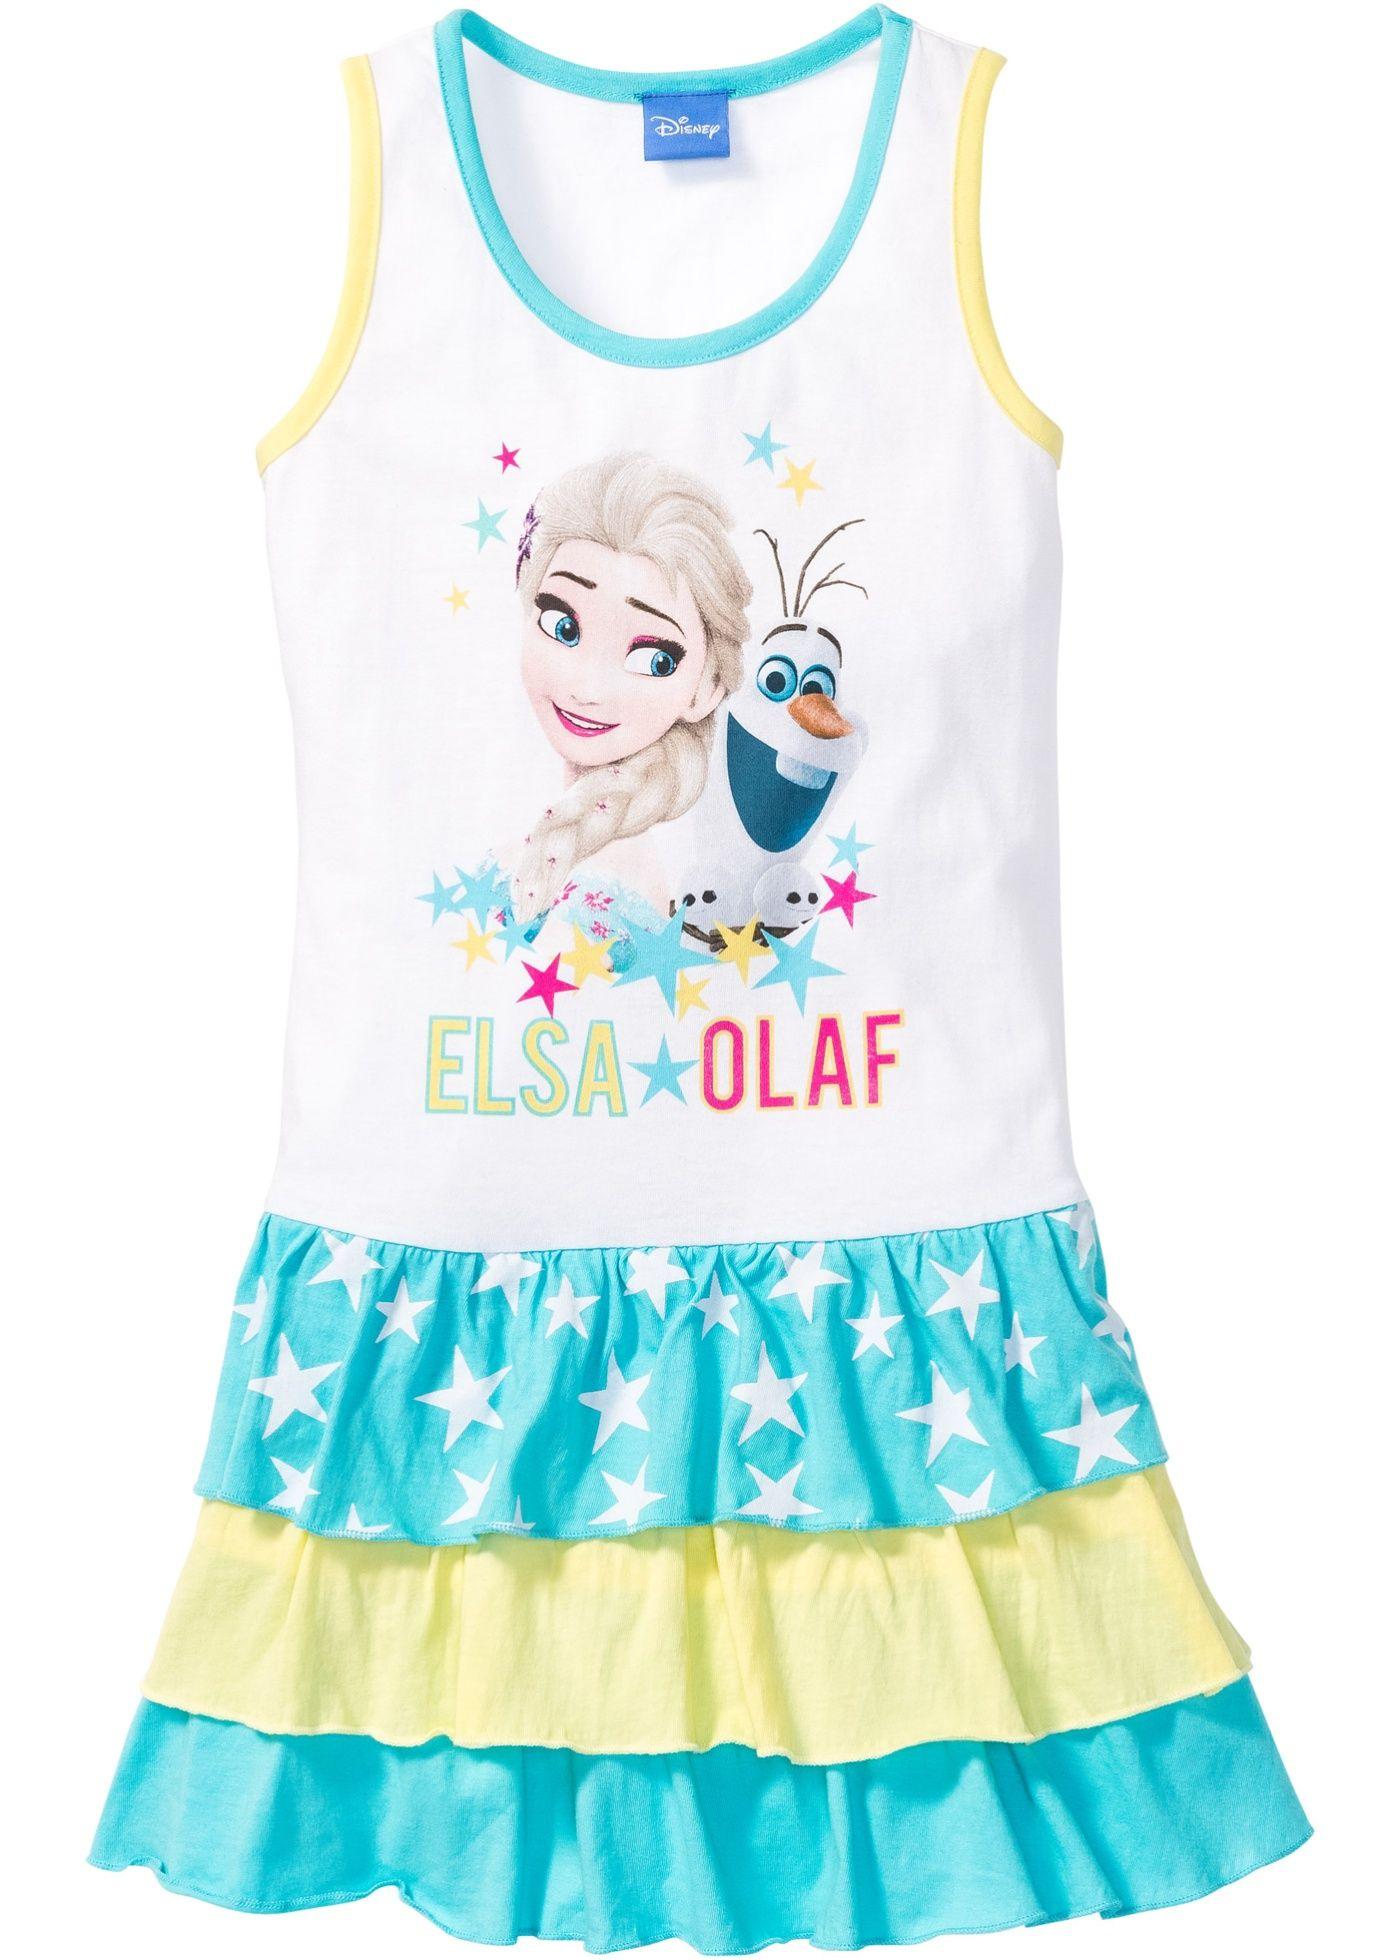 Bonprix #Mädchen,Kinder #FROZEN #Kleid #11 #mode #ootd